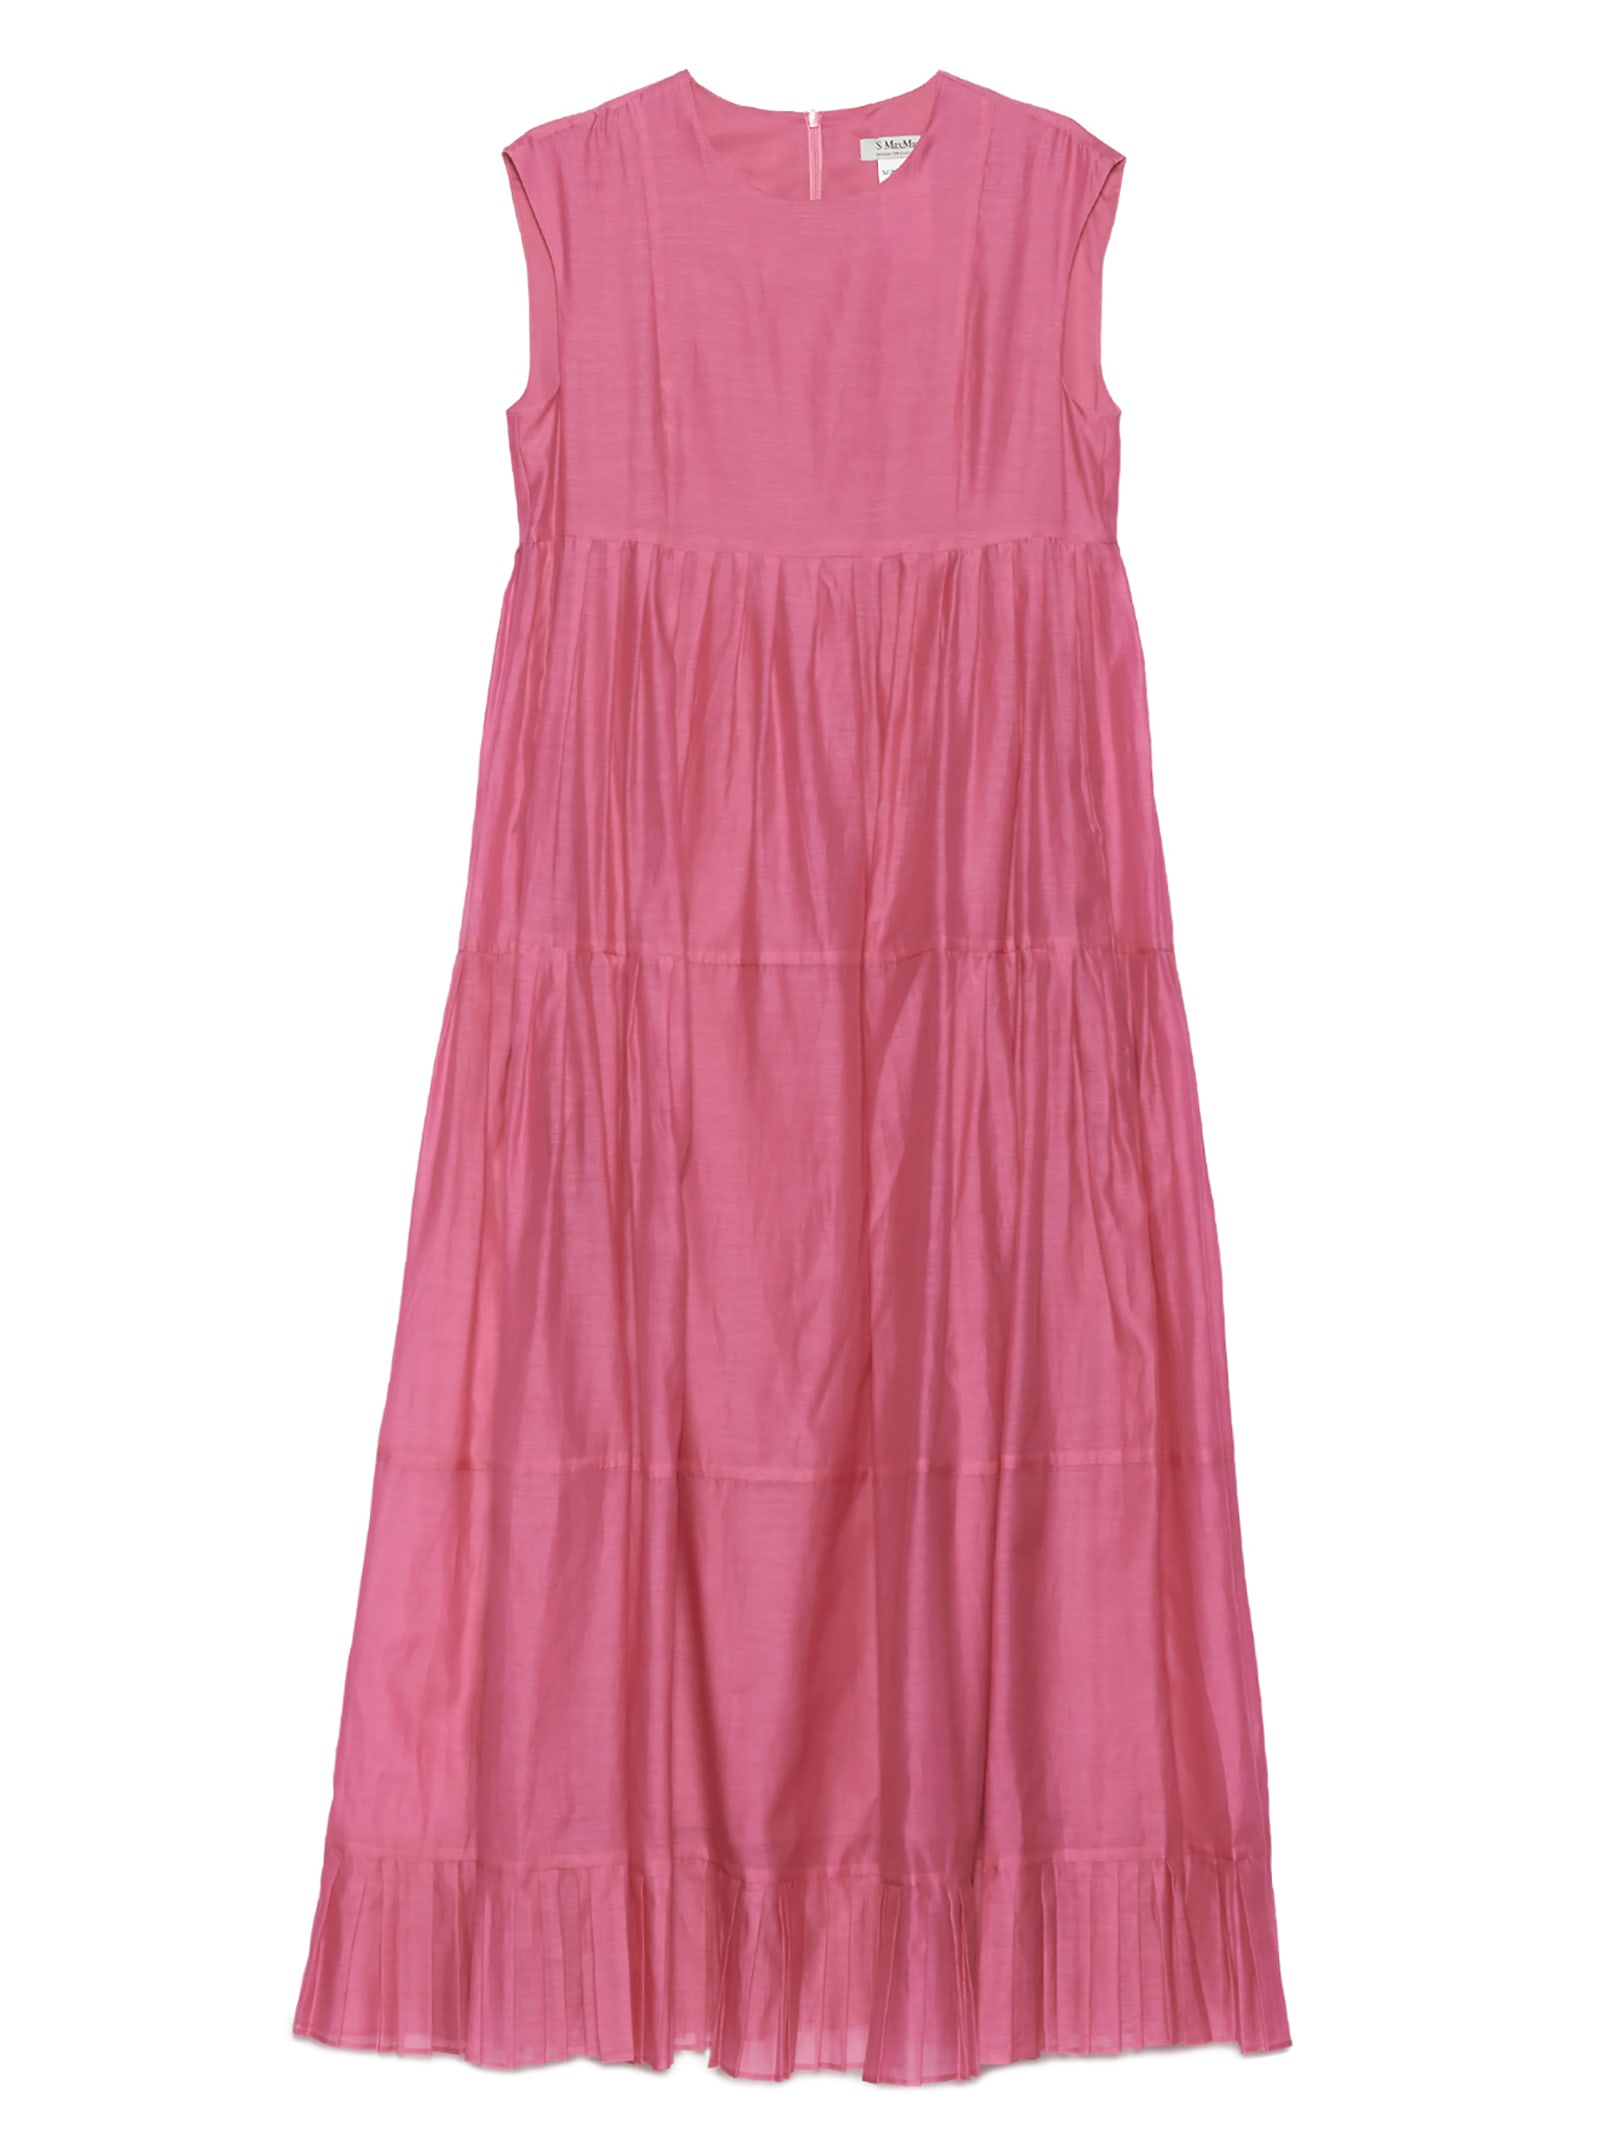 Buy s Max Mara lidia Dress online, shop S Max Mara with free shipping